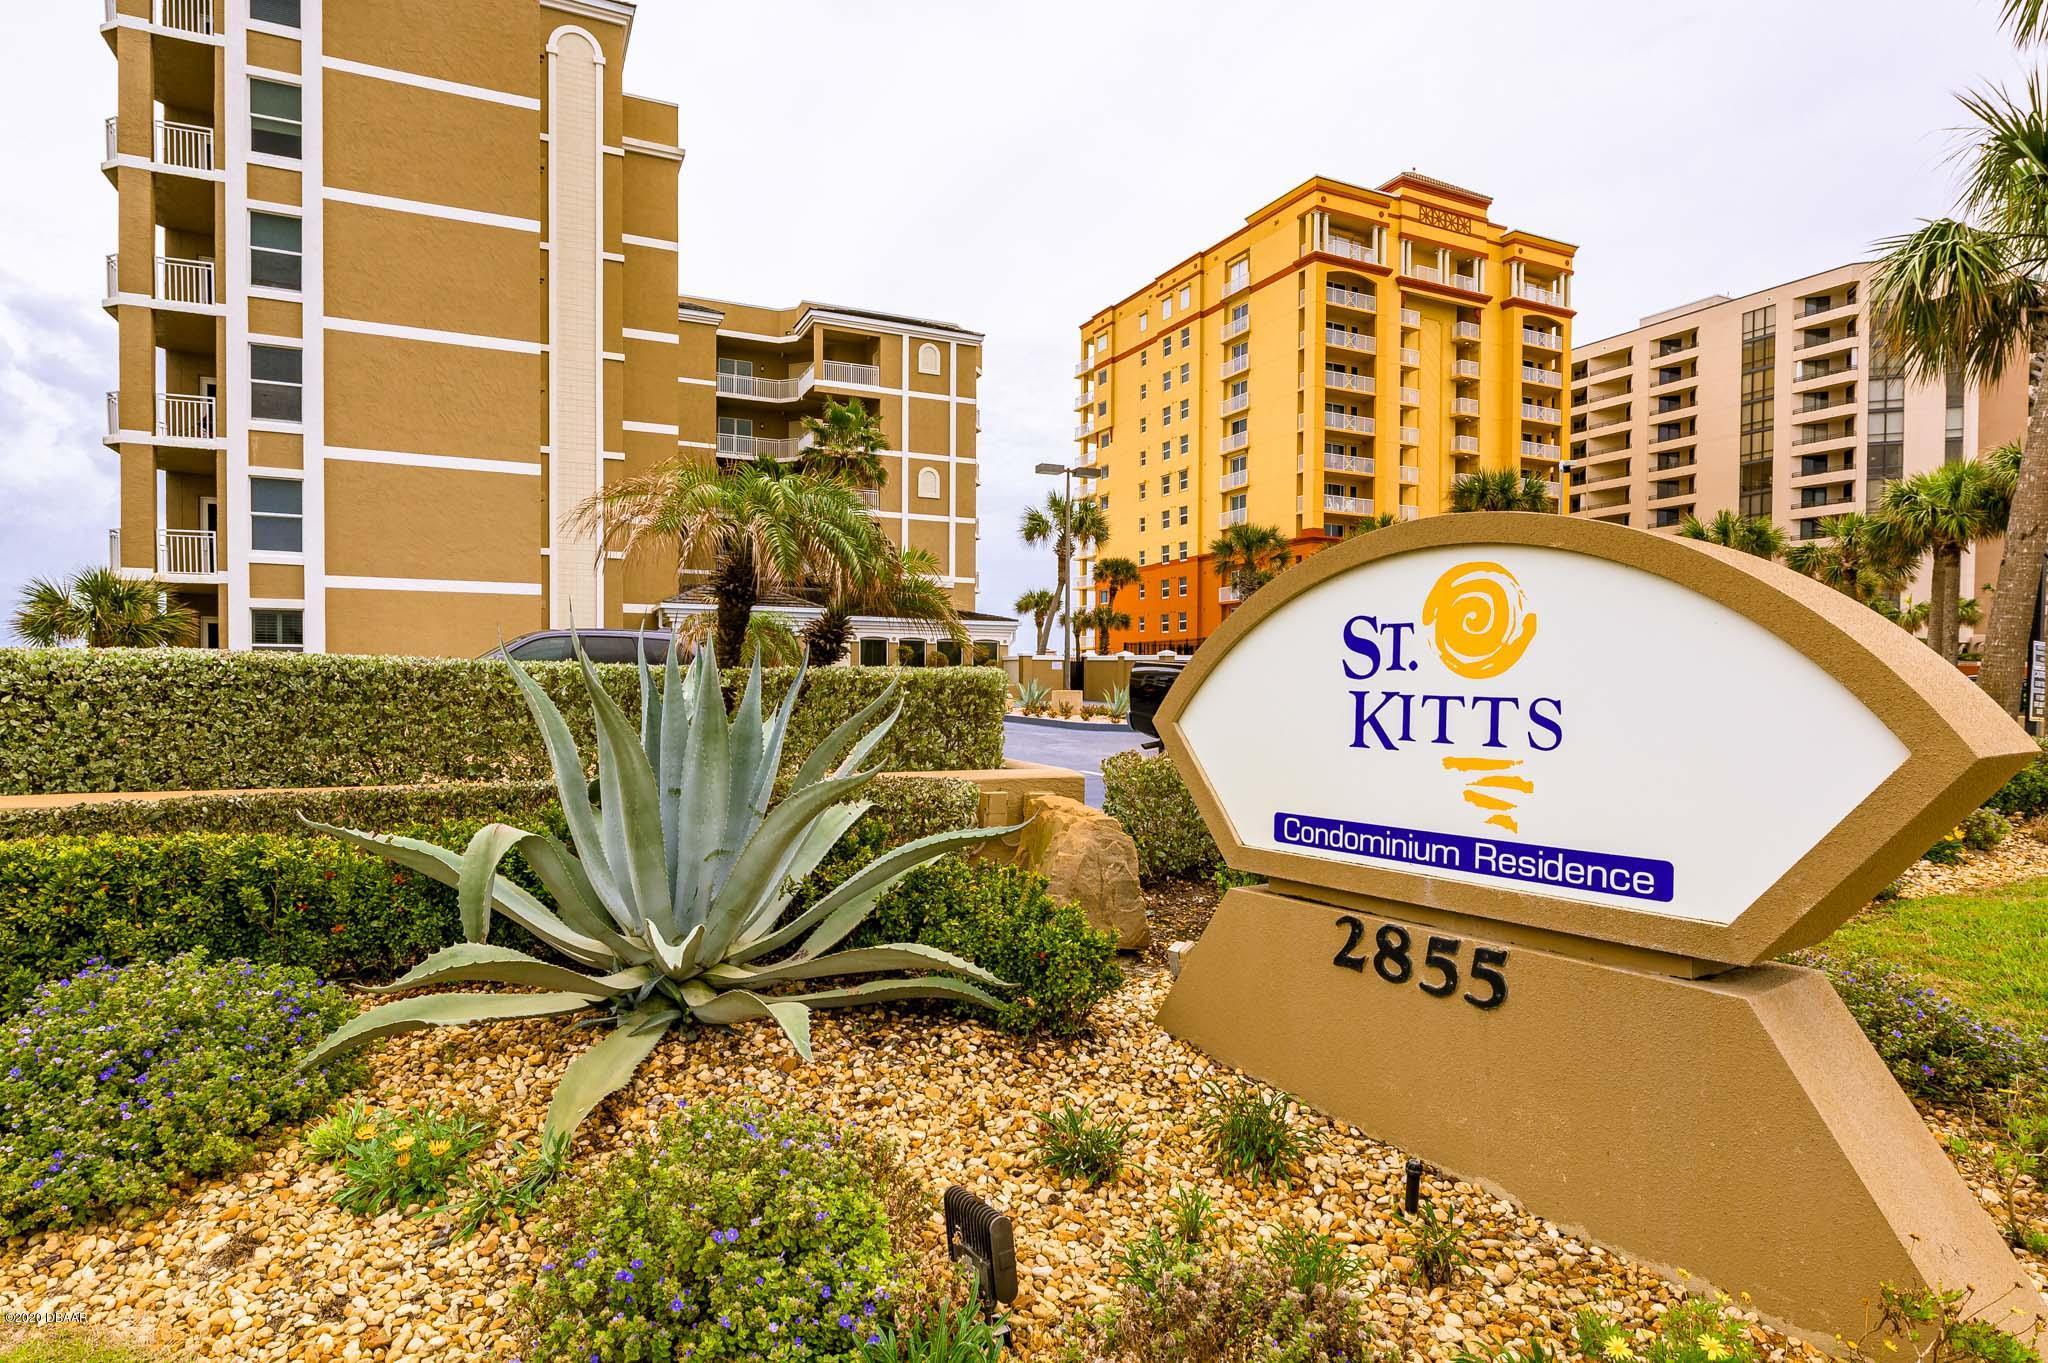 Photo of 2855 S Atlantic Avenue #101, Daytona Beach Shores, FL 32118